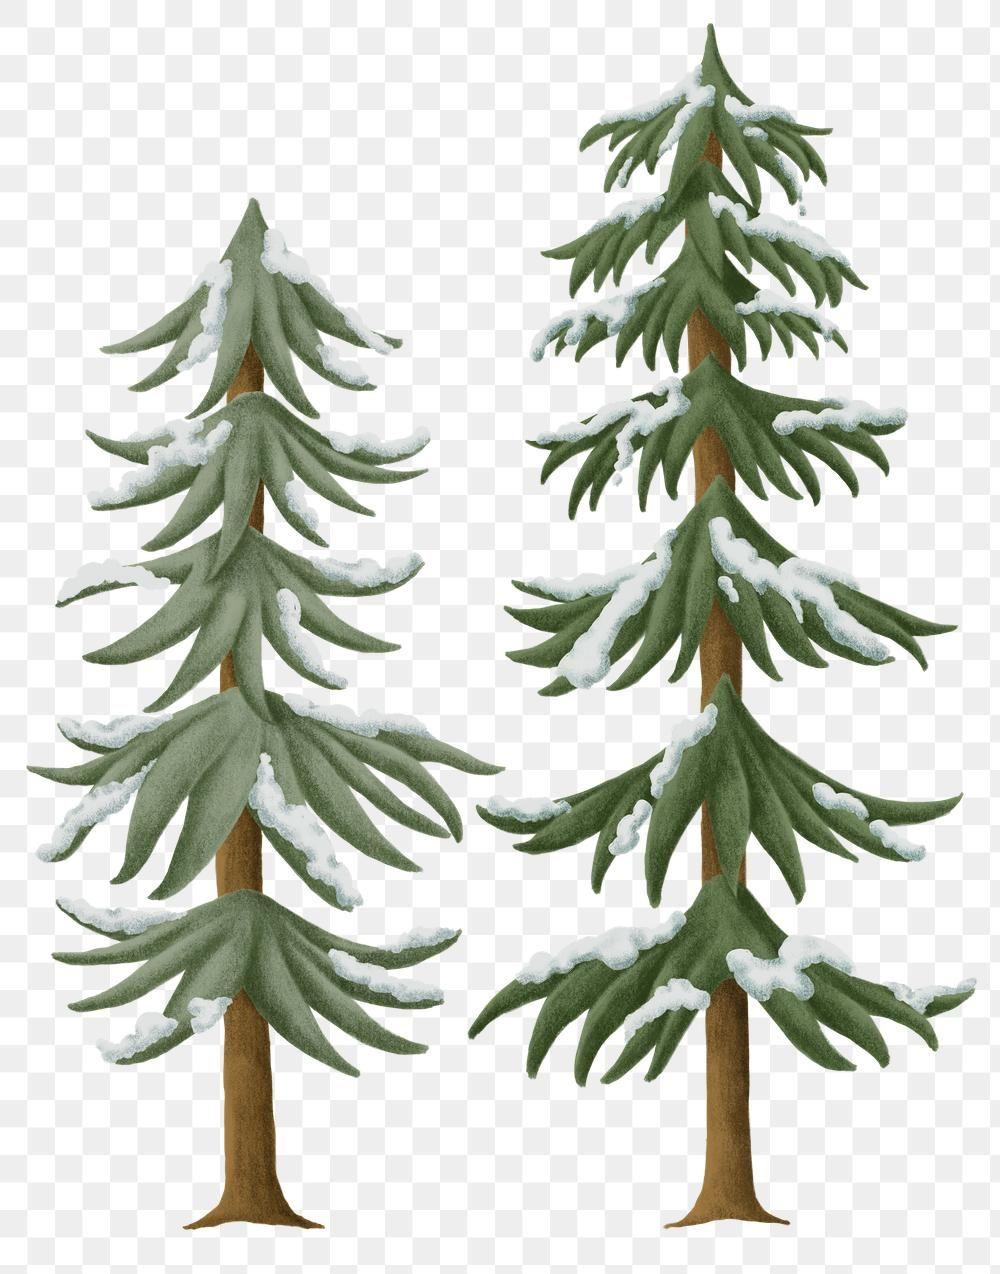 Download Premium Png Of Winter Pine Tree Png Sticker Christmas Season Set Christmas Seasons Winter Theme Artwork